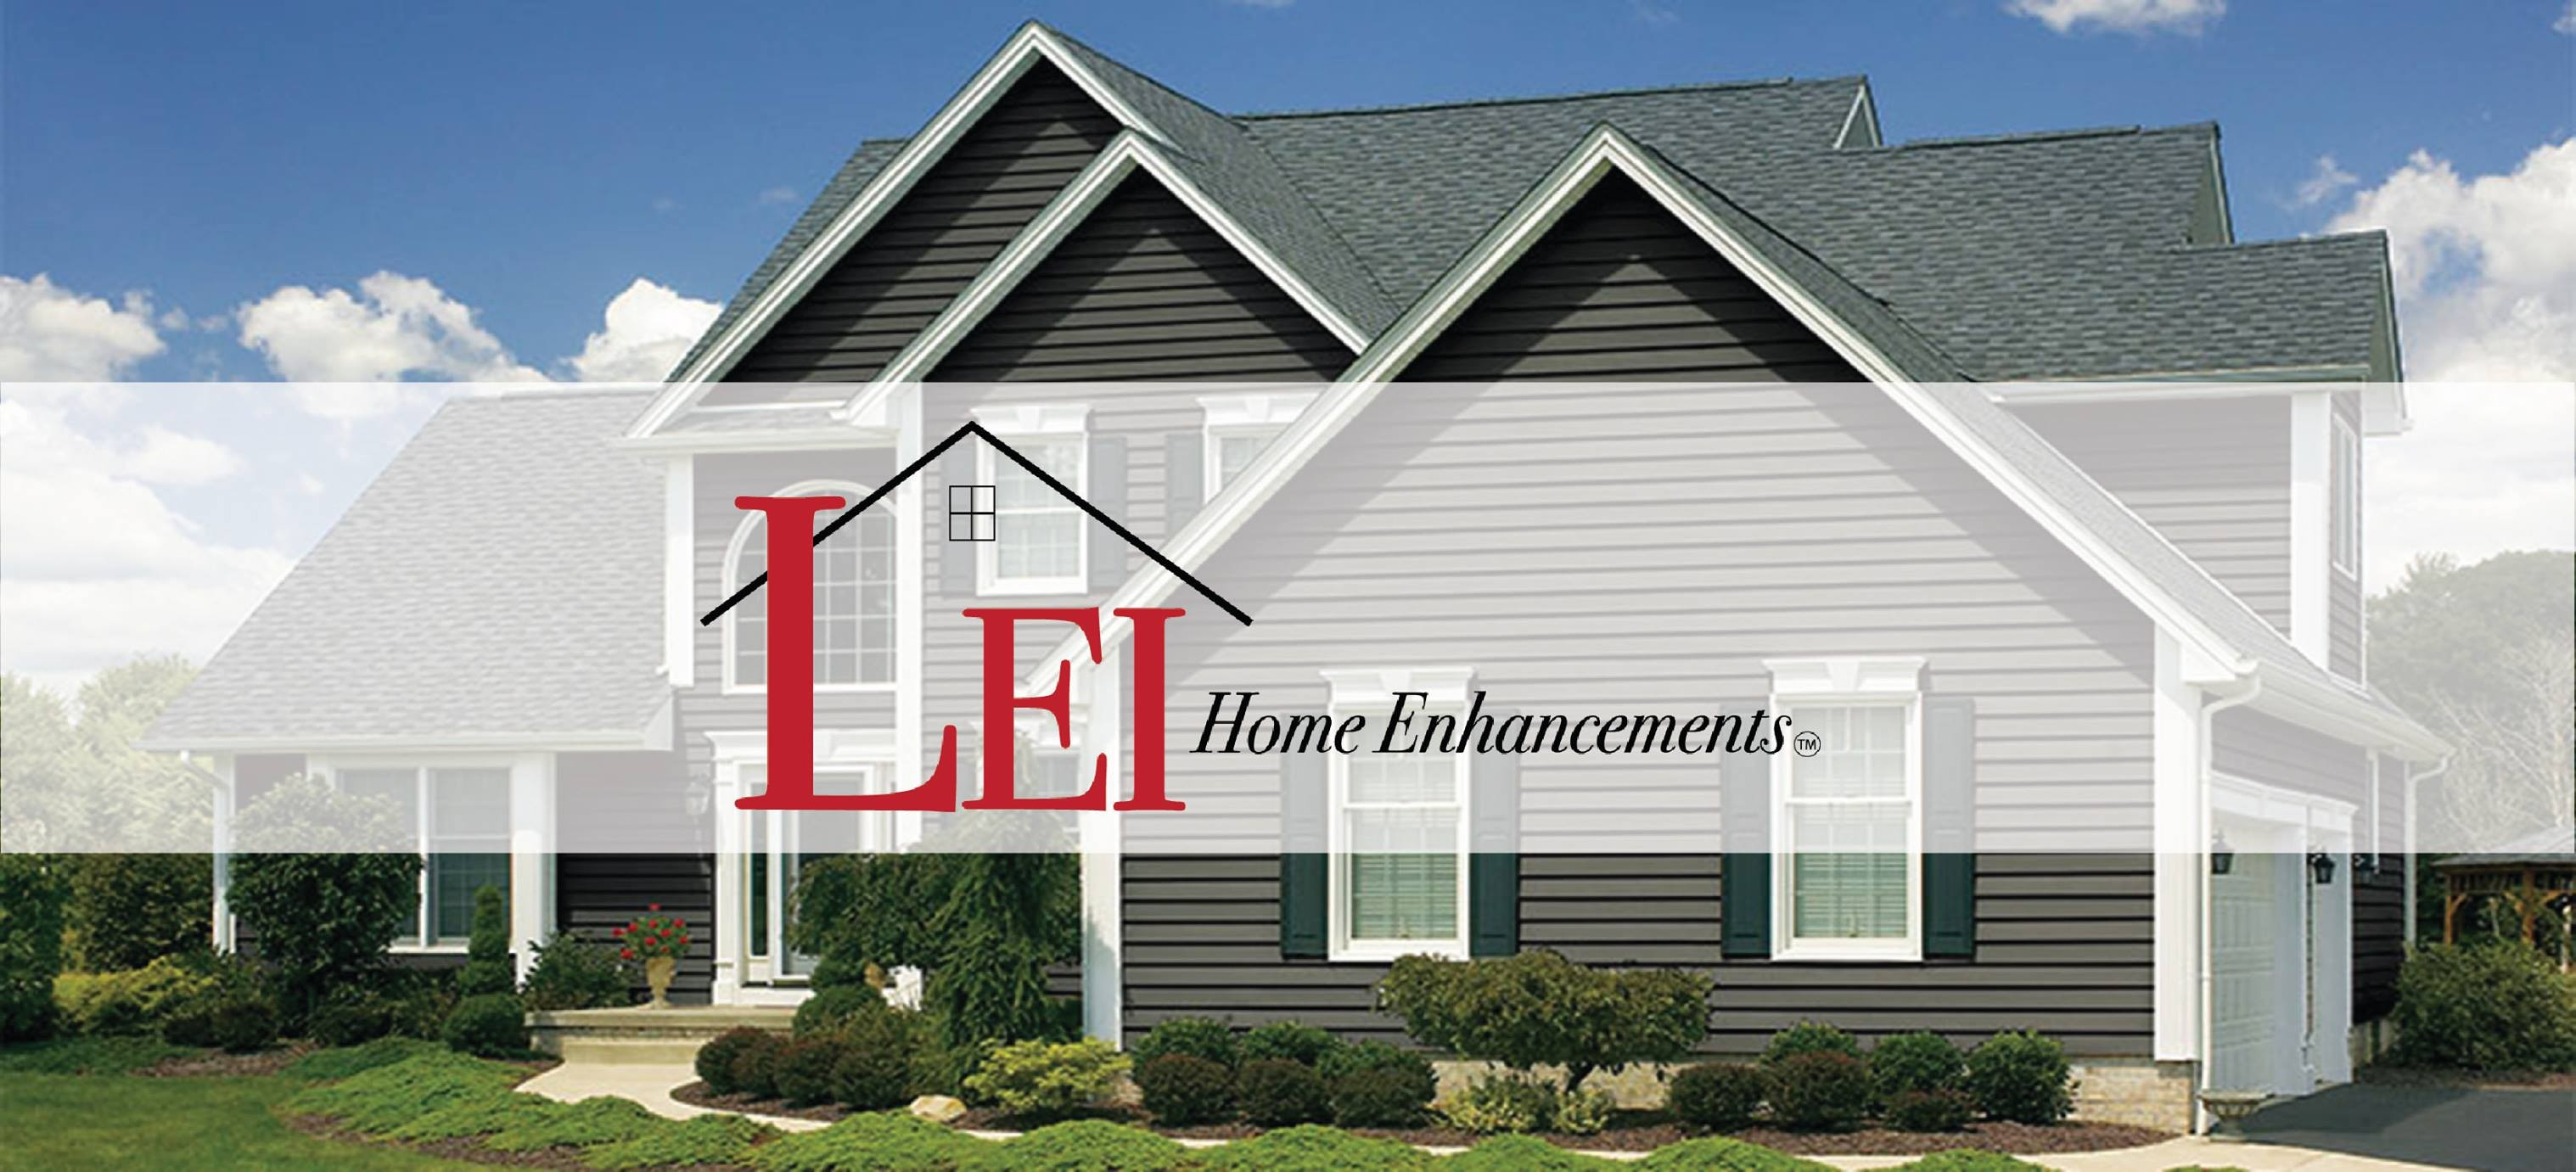 Tremendous Lei Home Enhancements Linkedin Interior Design Ideas Clesiryabchikinfo